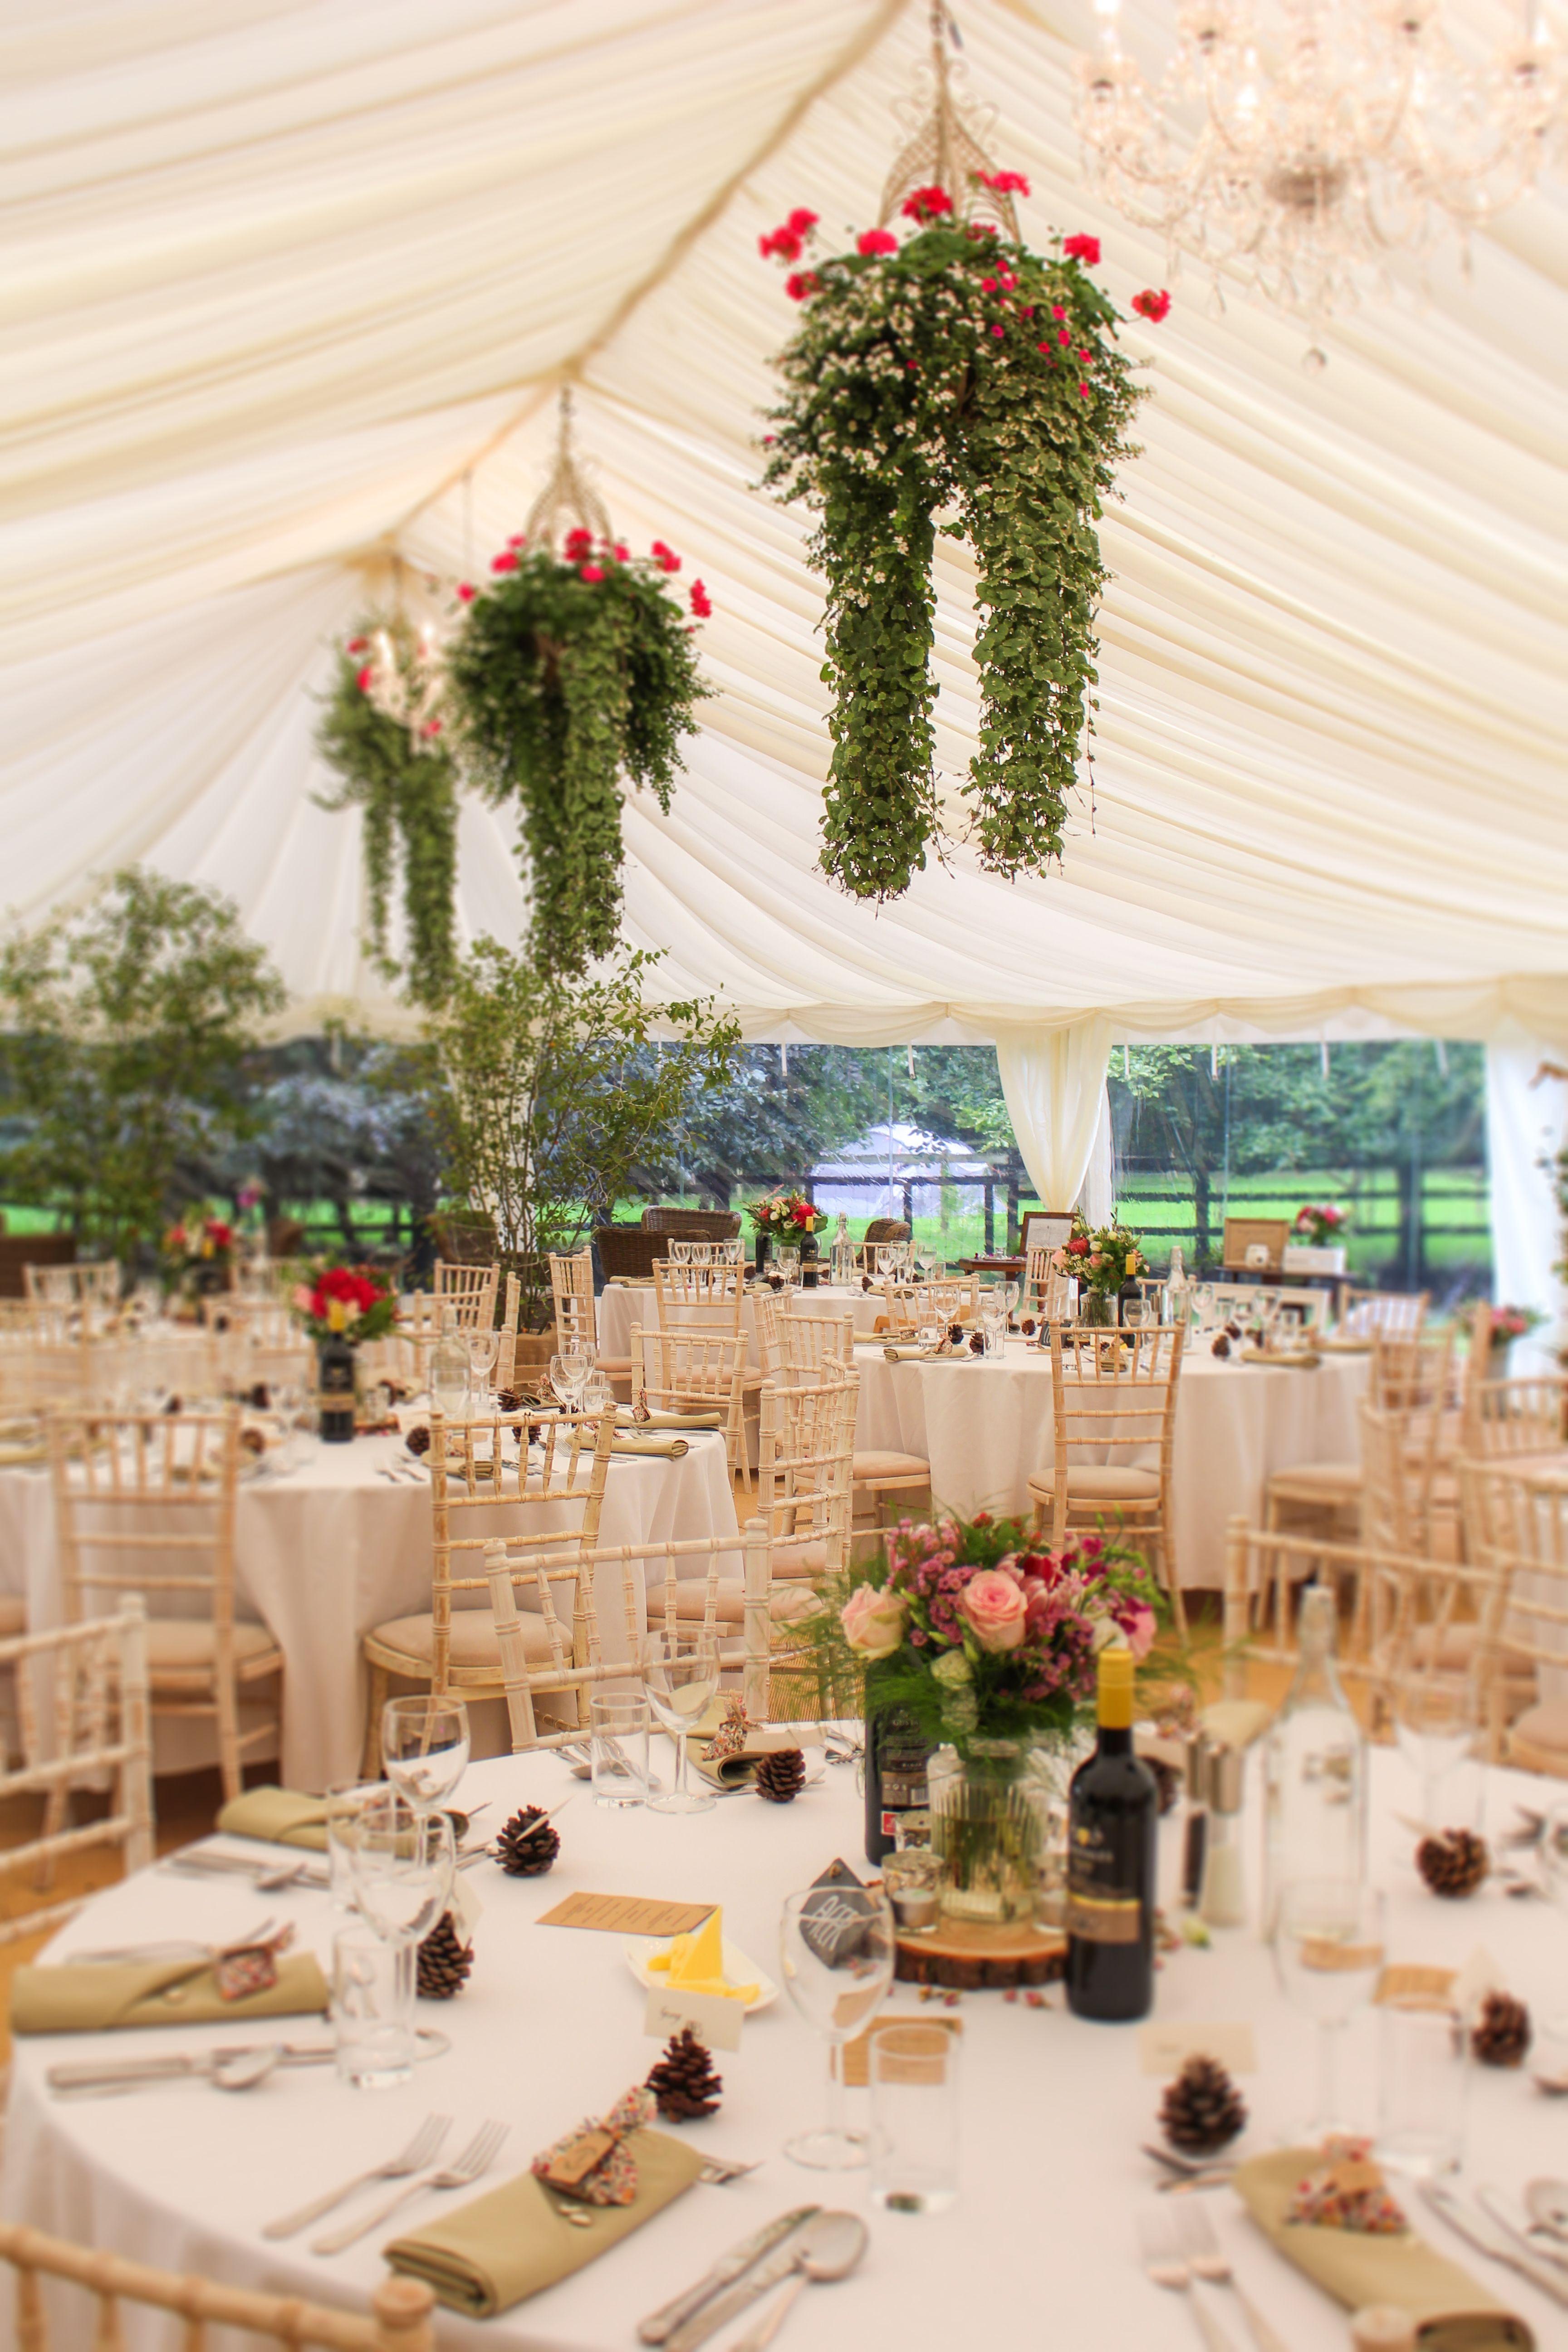 Marquee Wedding Decorations Garden Country Wedding Spring Wedding